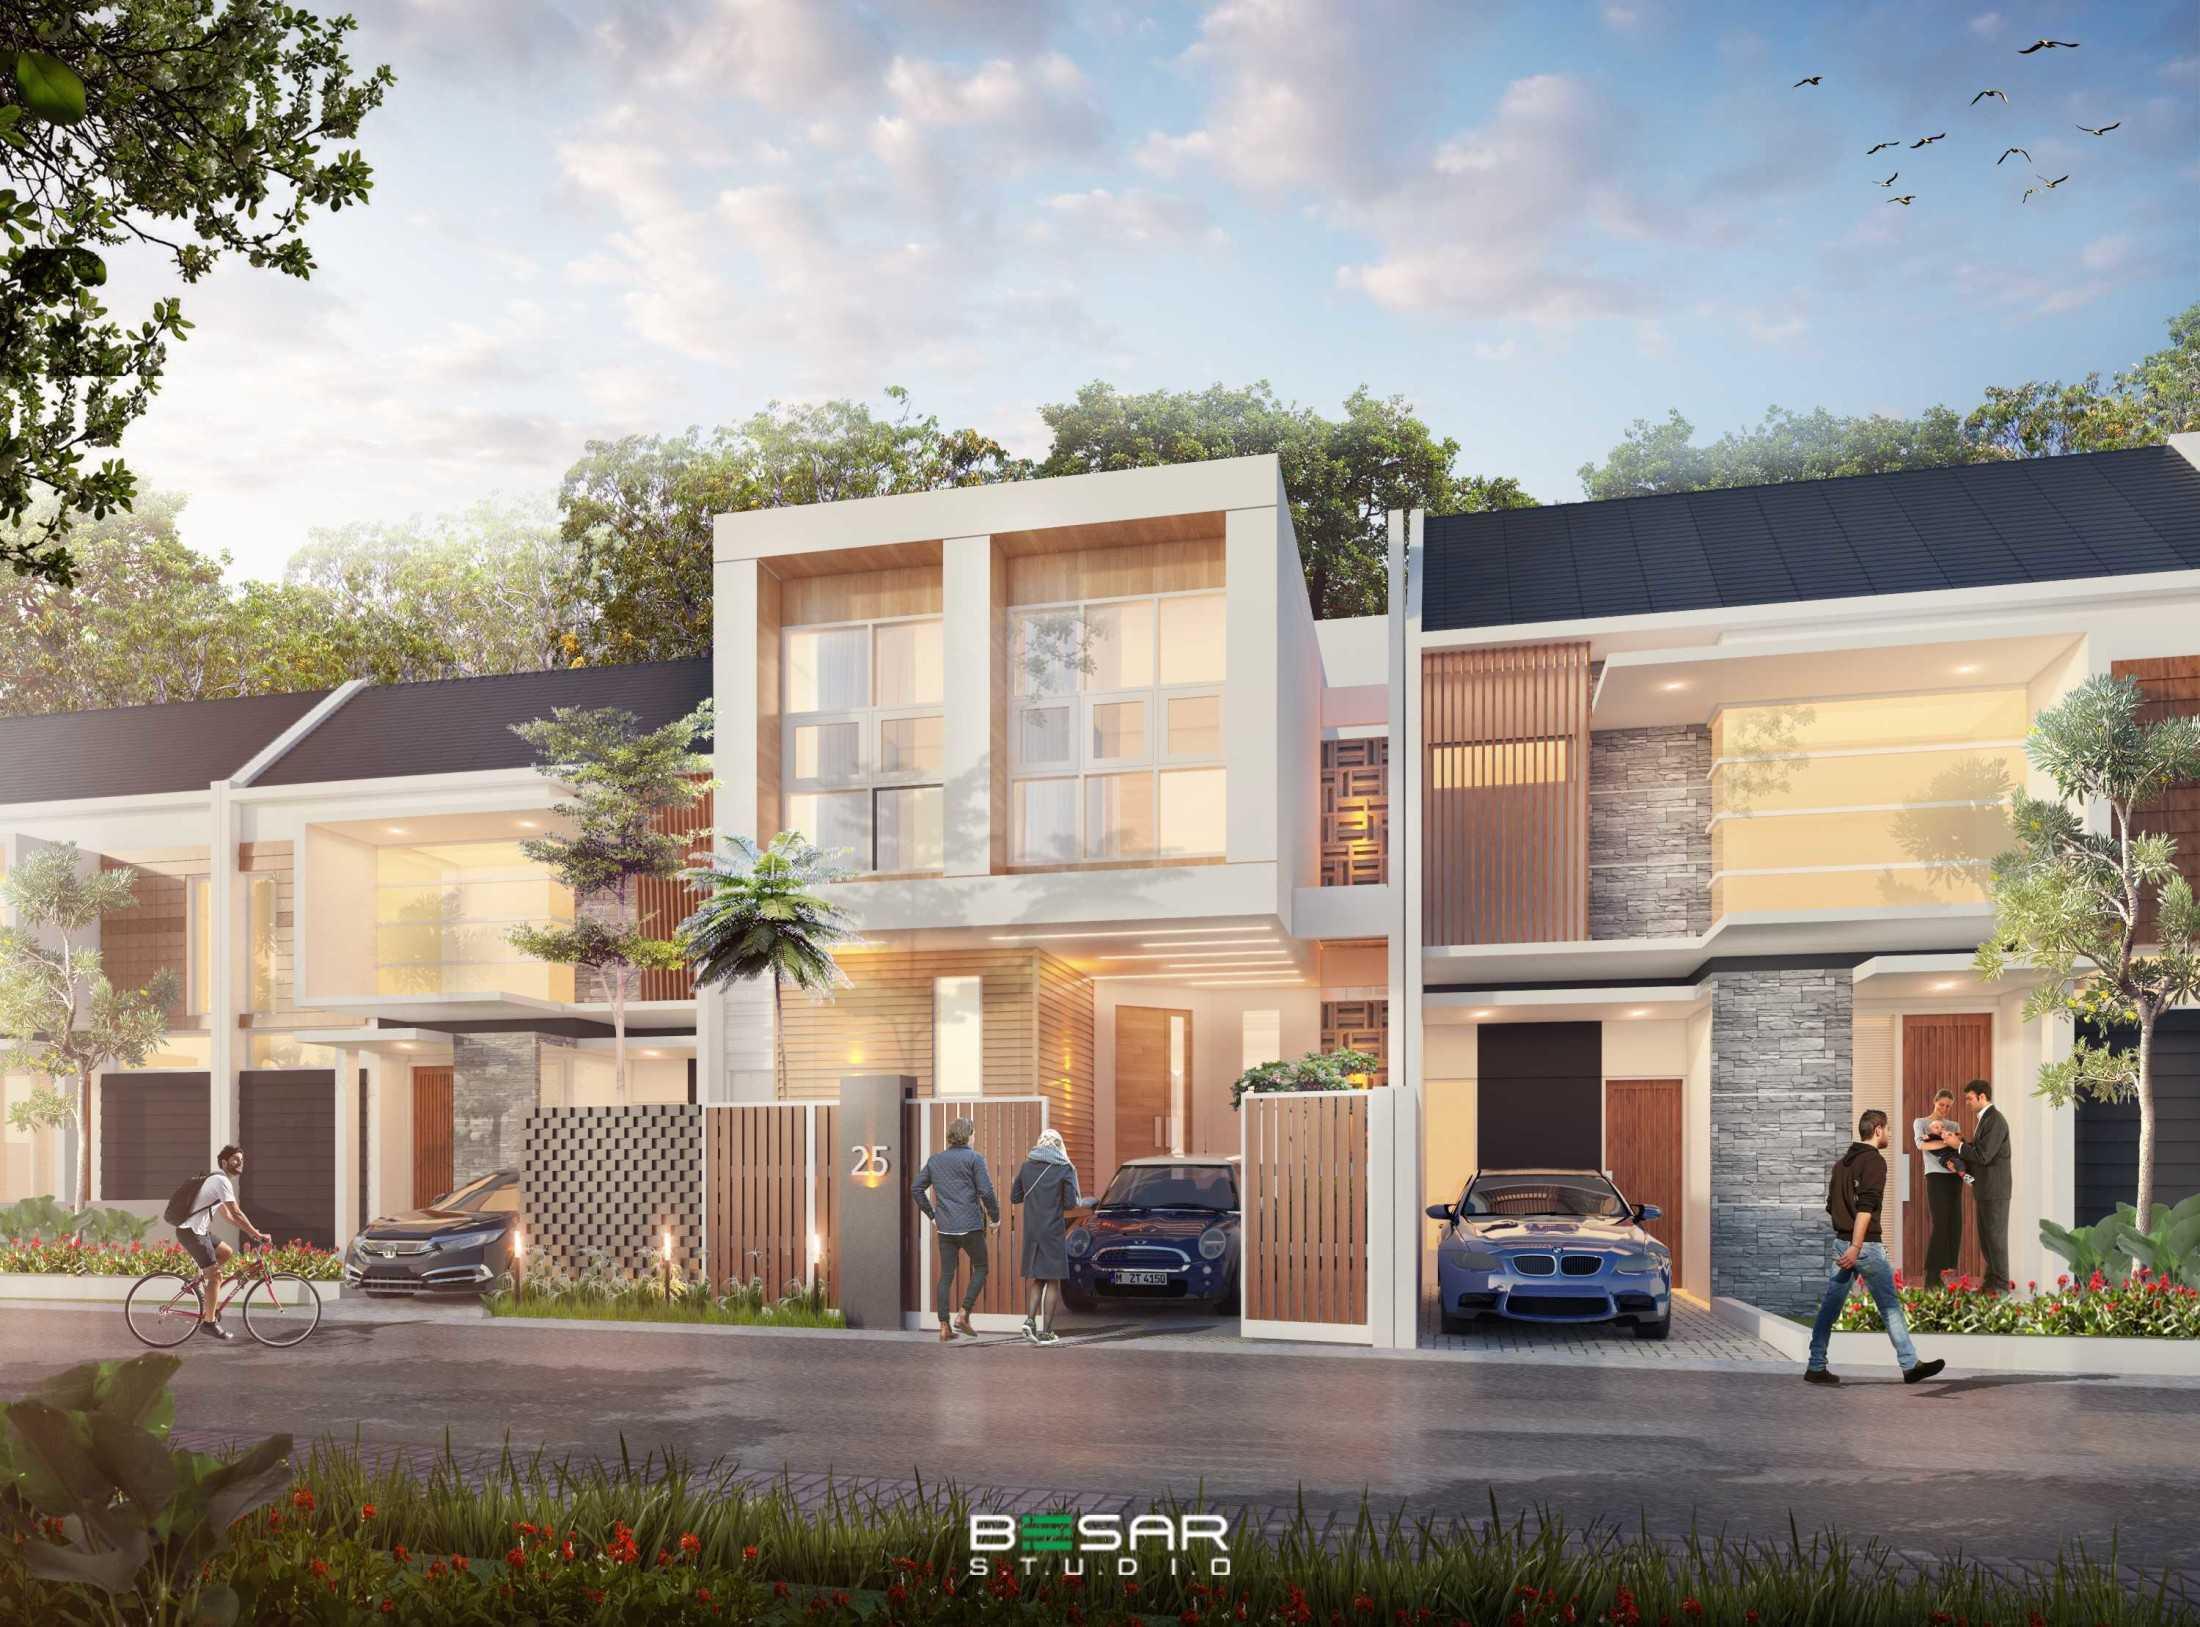 Studio Besar E-House, Sentul Sentul, Babakan Madang, Bogor, Jawa Barat, Indonesia Sentul, Babakan Madang, Bogor, Jawa Barat, Indonesia Studio-Besar-E-House  59376